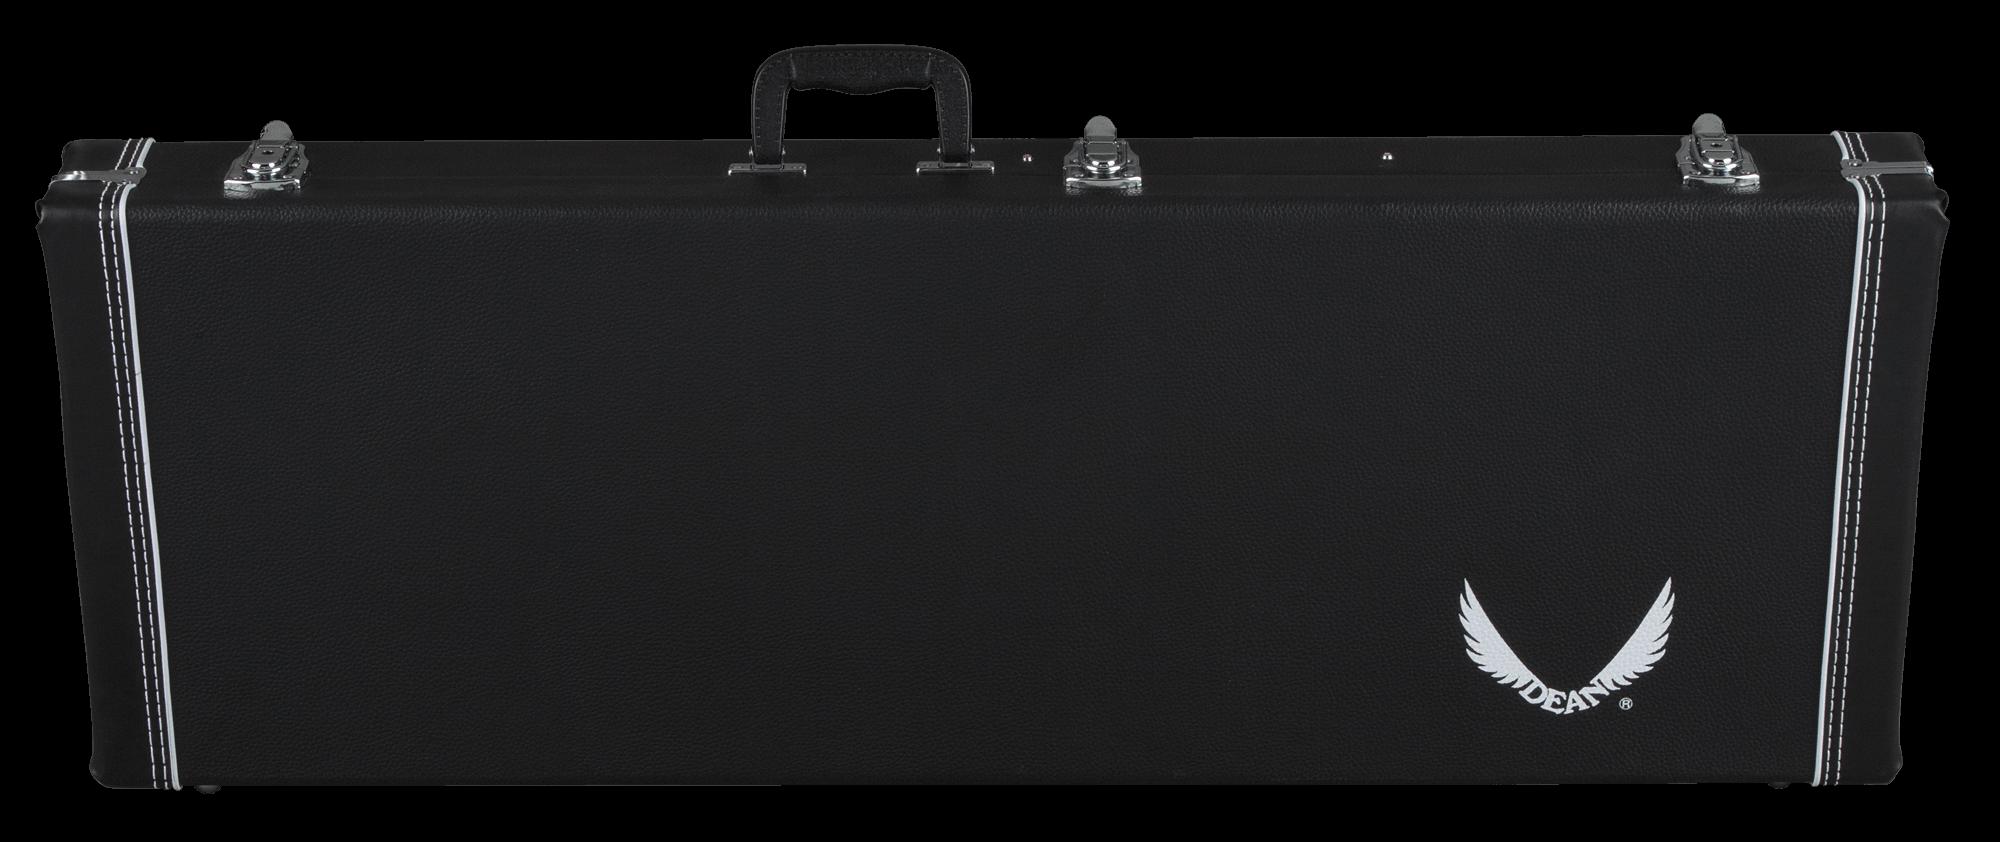 Dean Deluxe Hard Case 6 Inline & Cadi